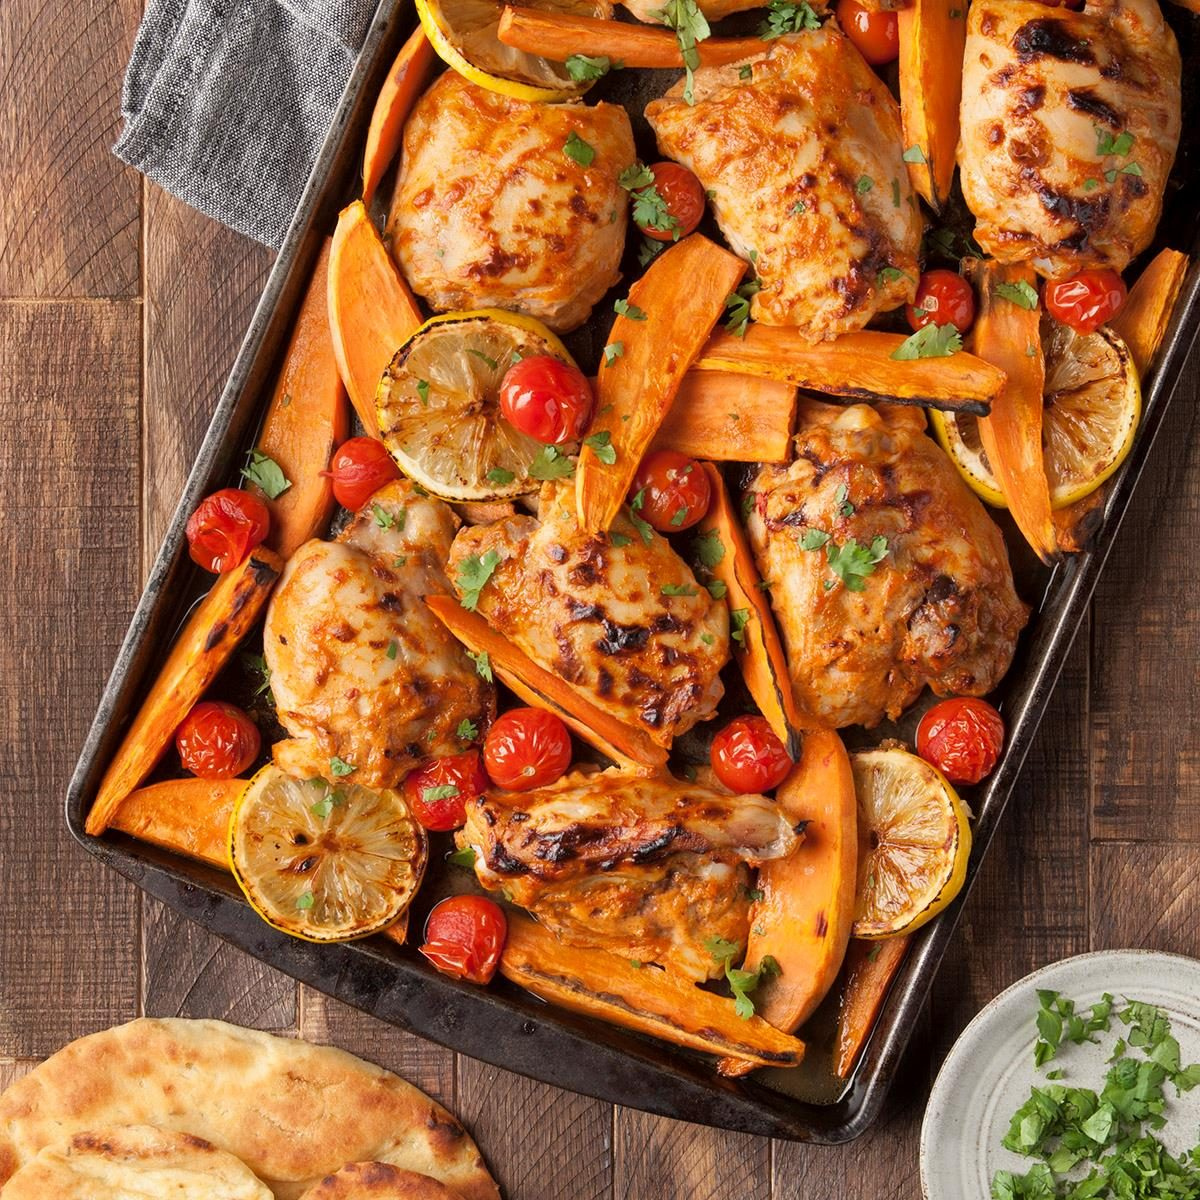 Thursday: Sheet-Pan Tandoori Chicken